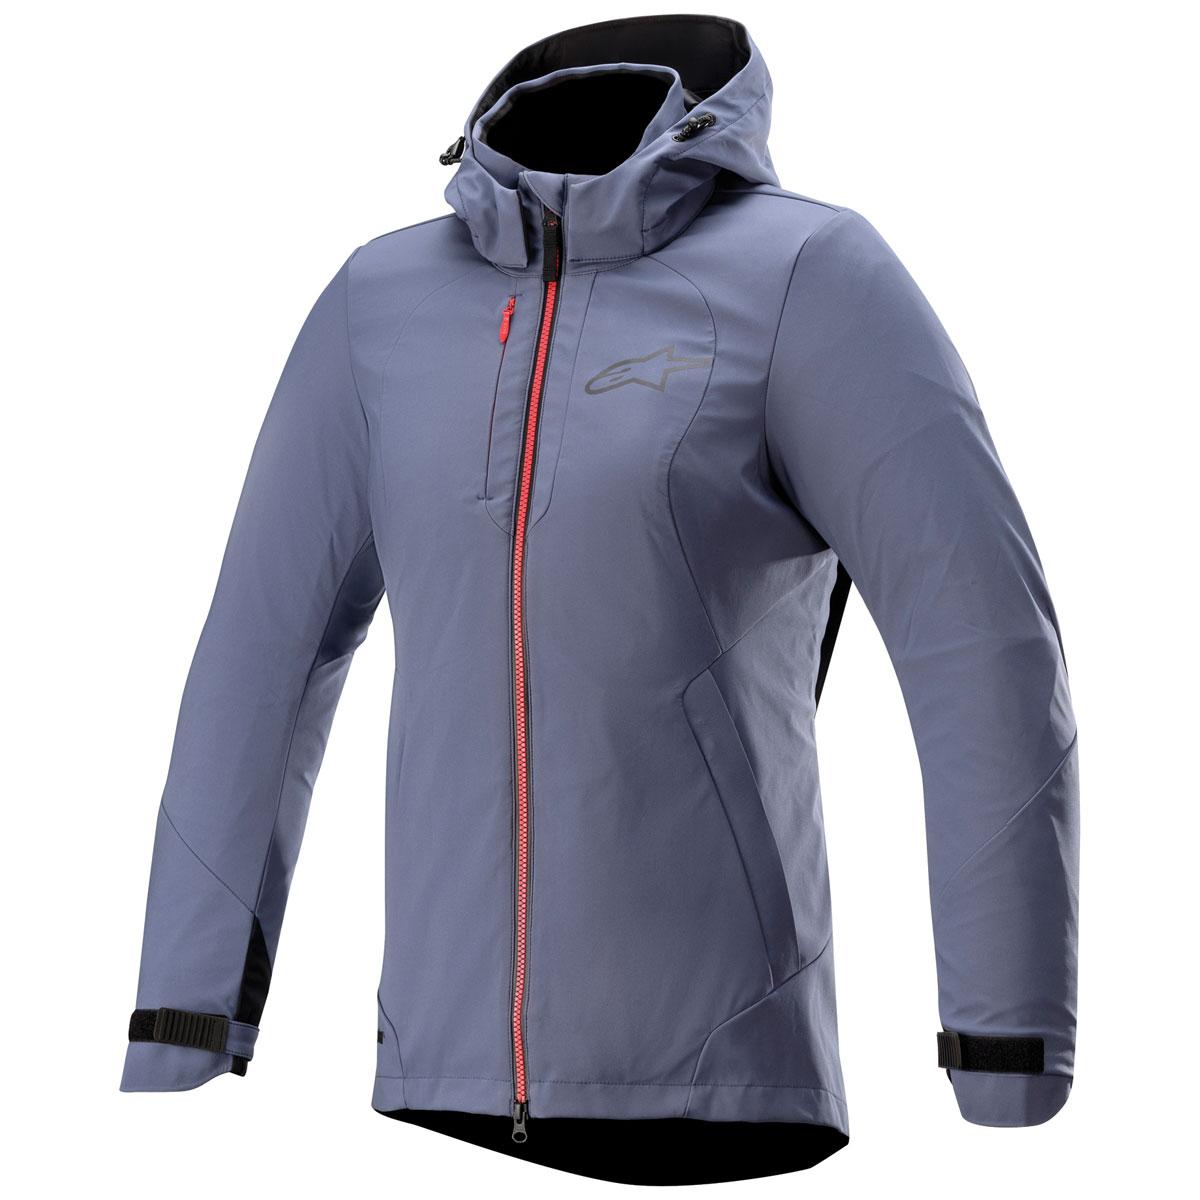 Alpinestars Women's Stella Moony Drystar Slate/Coral Jacket